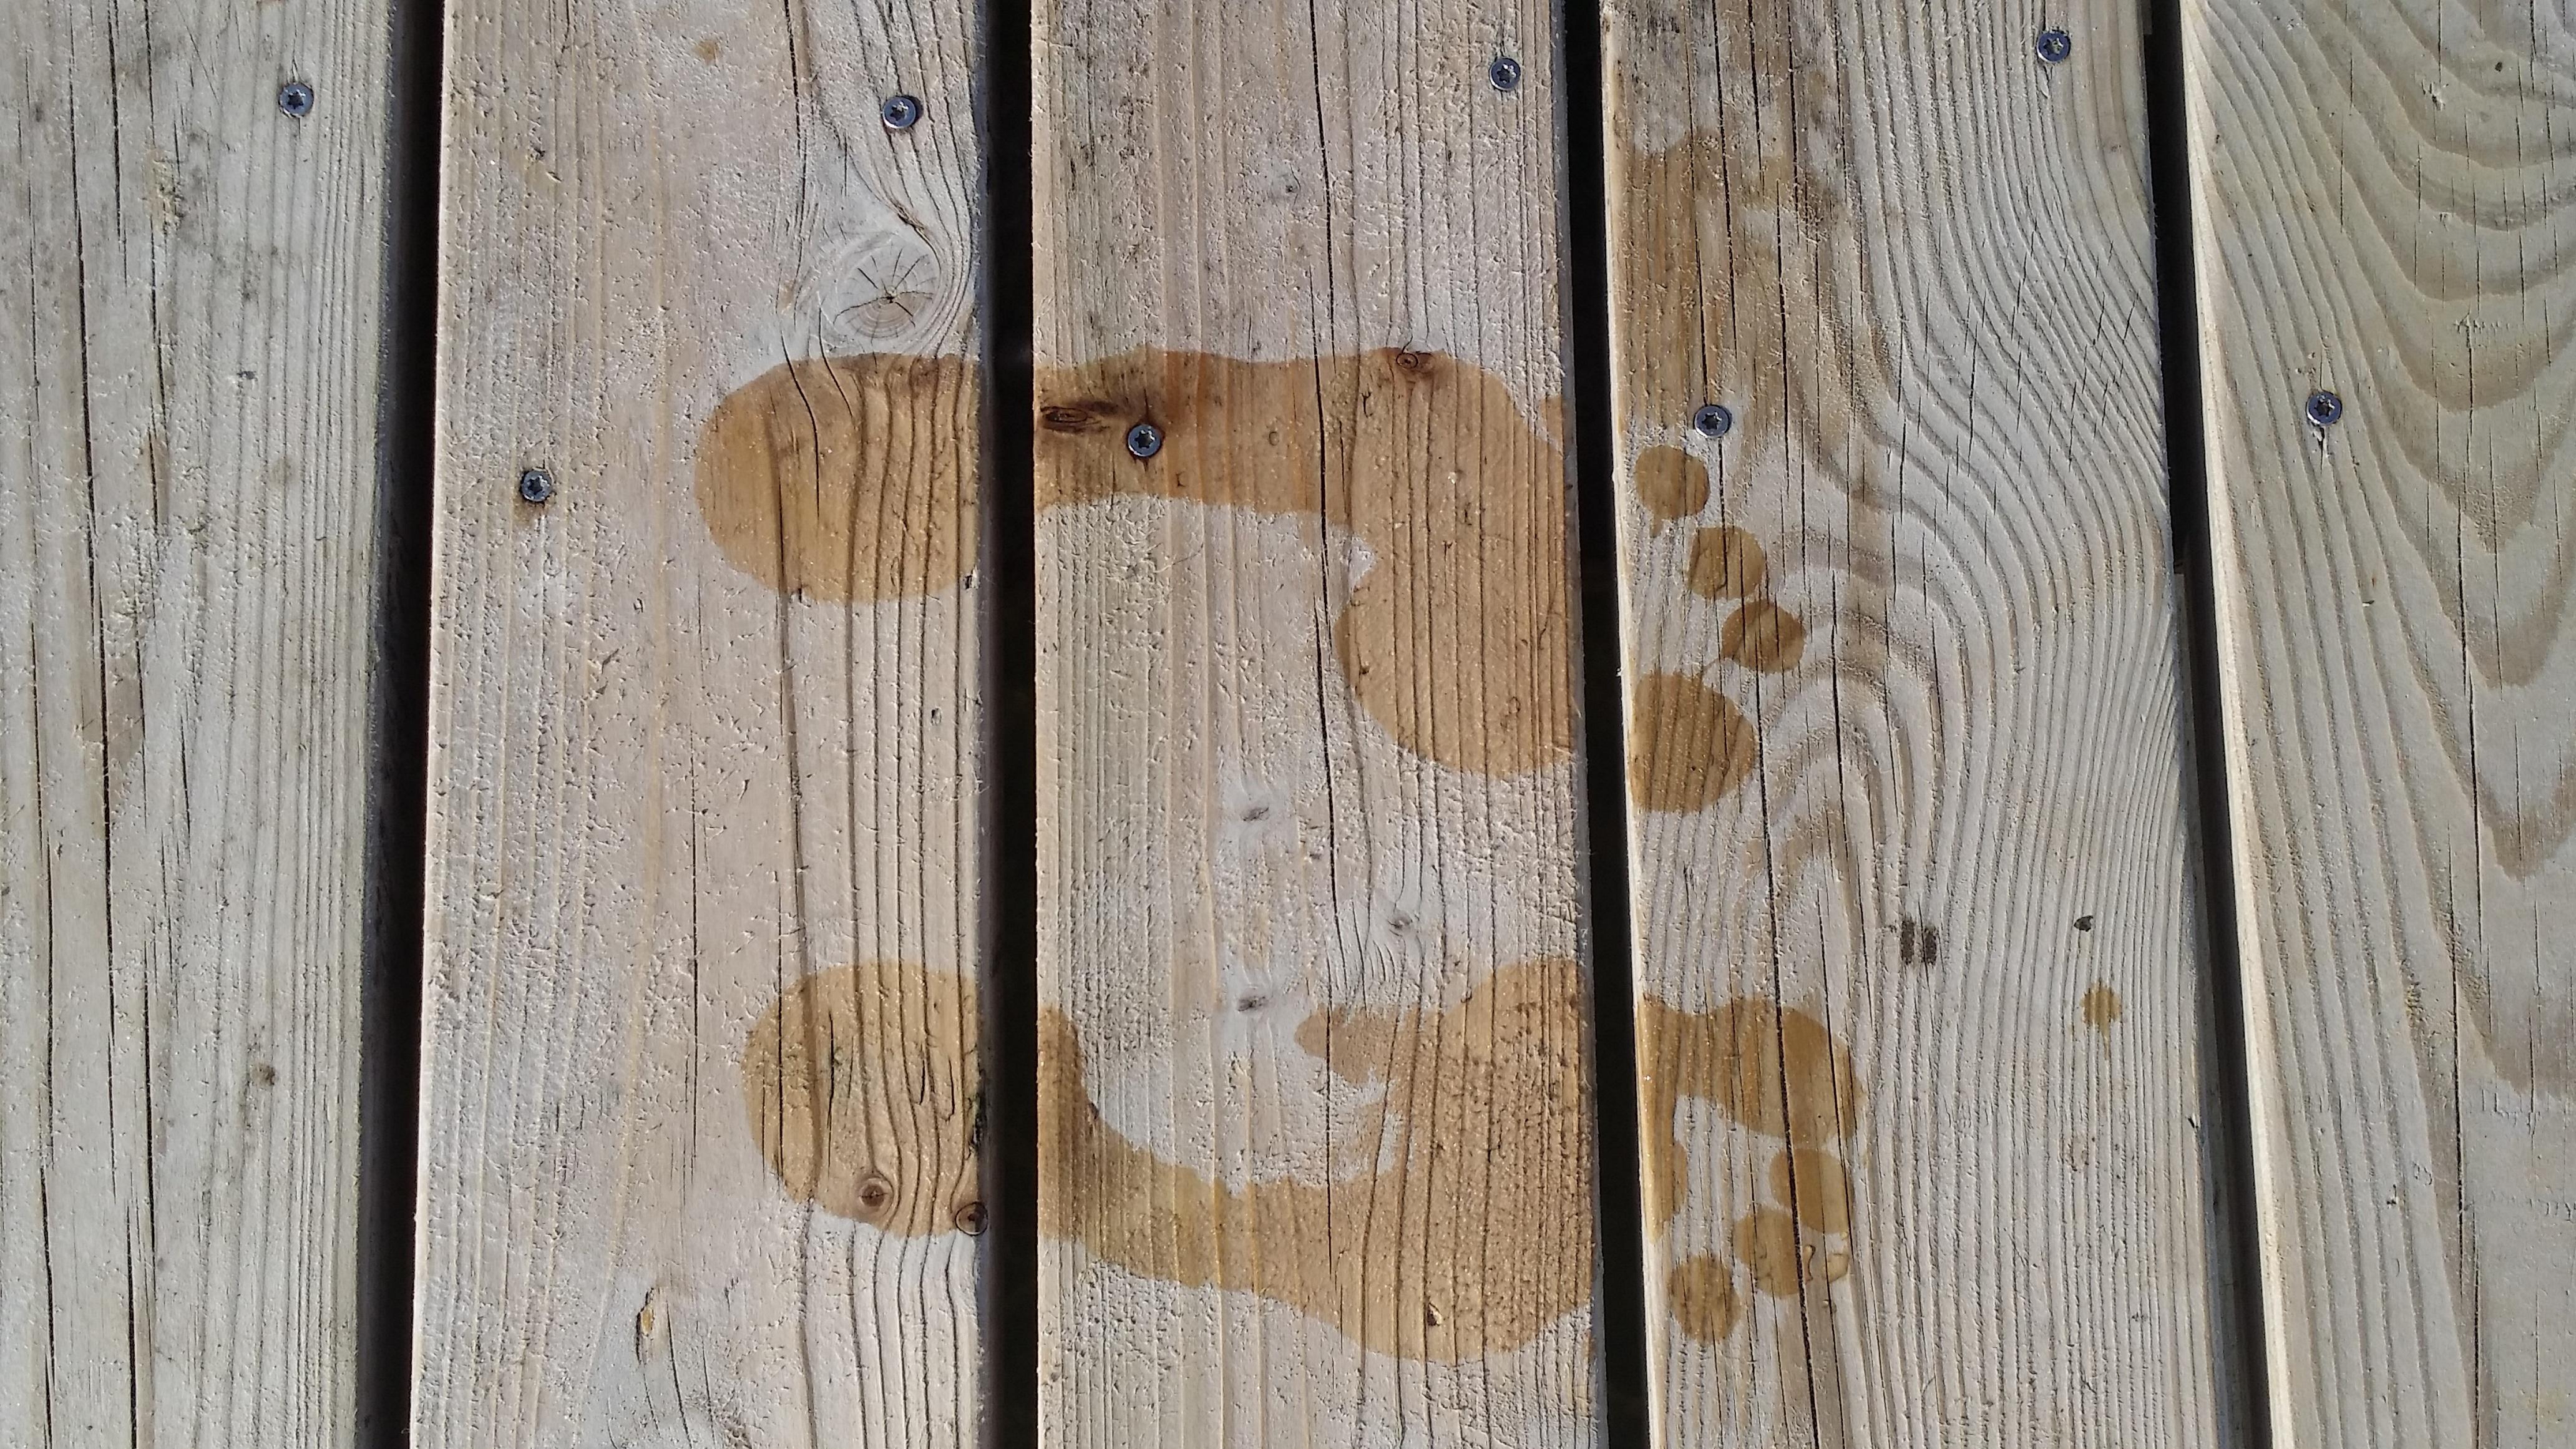 holz textur planke stock fe nass menschlich holz abdrcke hartholz bodenbelag holzboden mann machte objekt laminatboden - Hartholz Oder Laminatboden